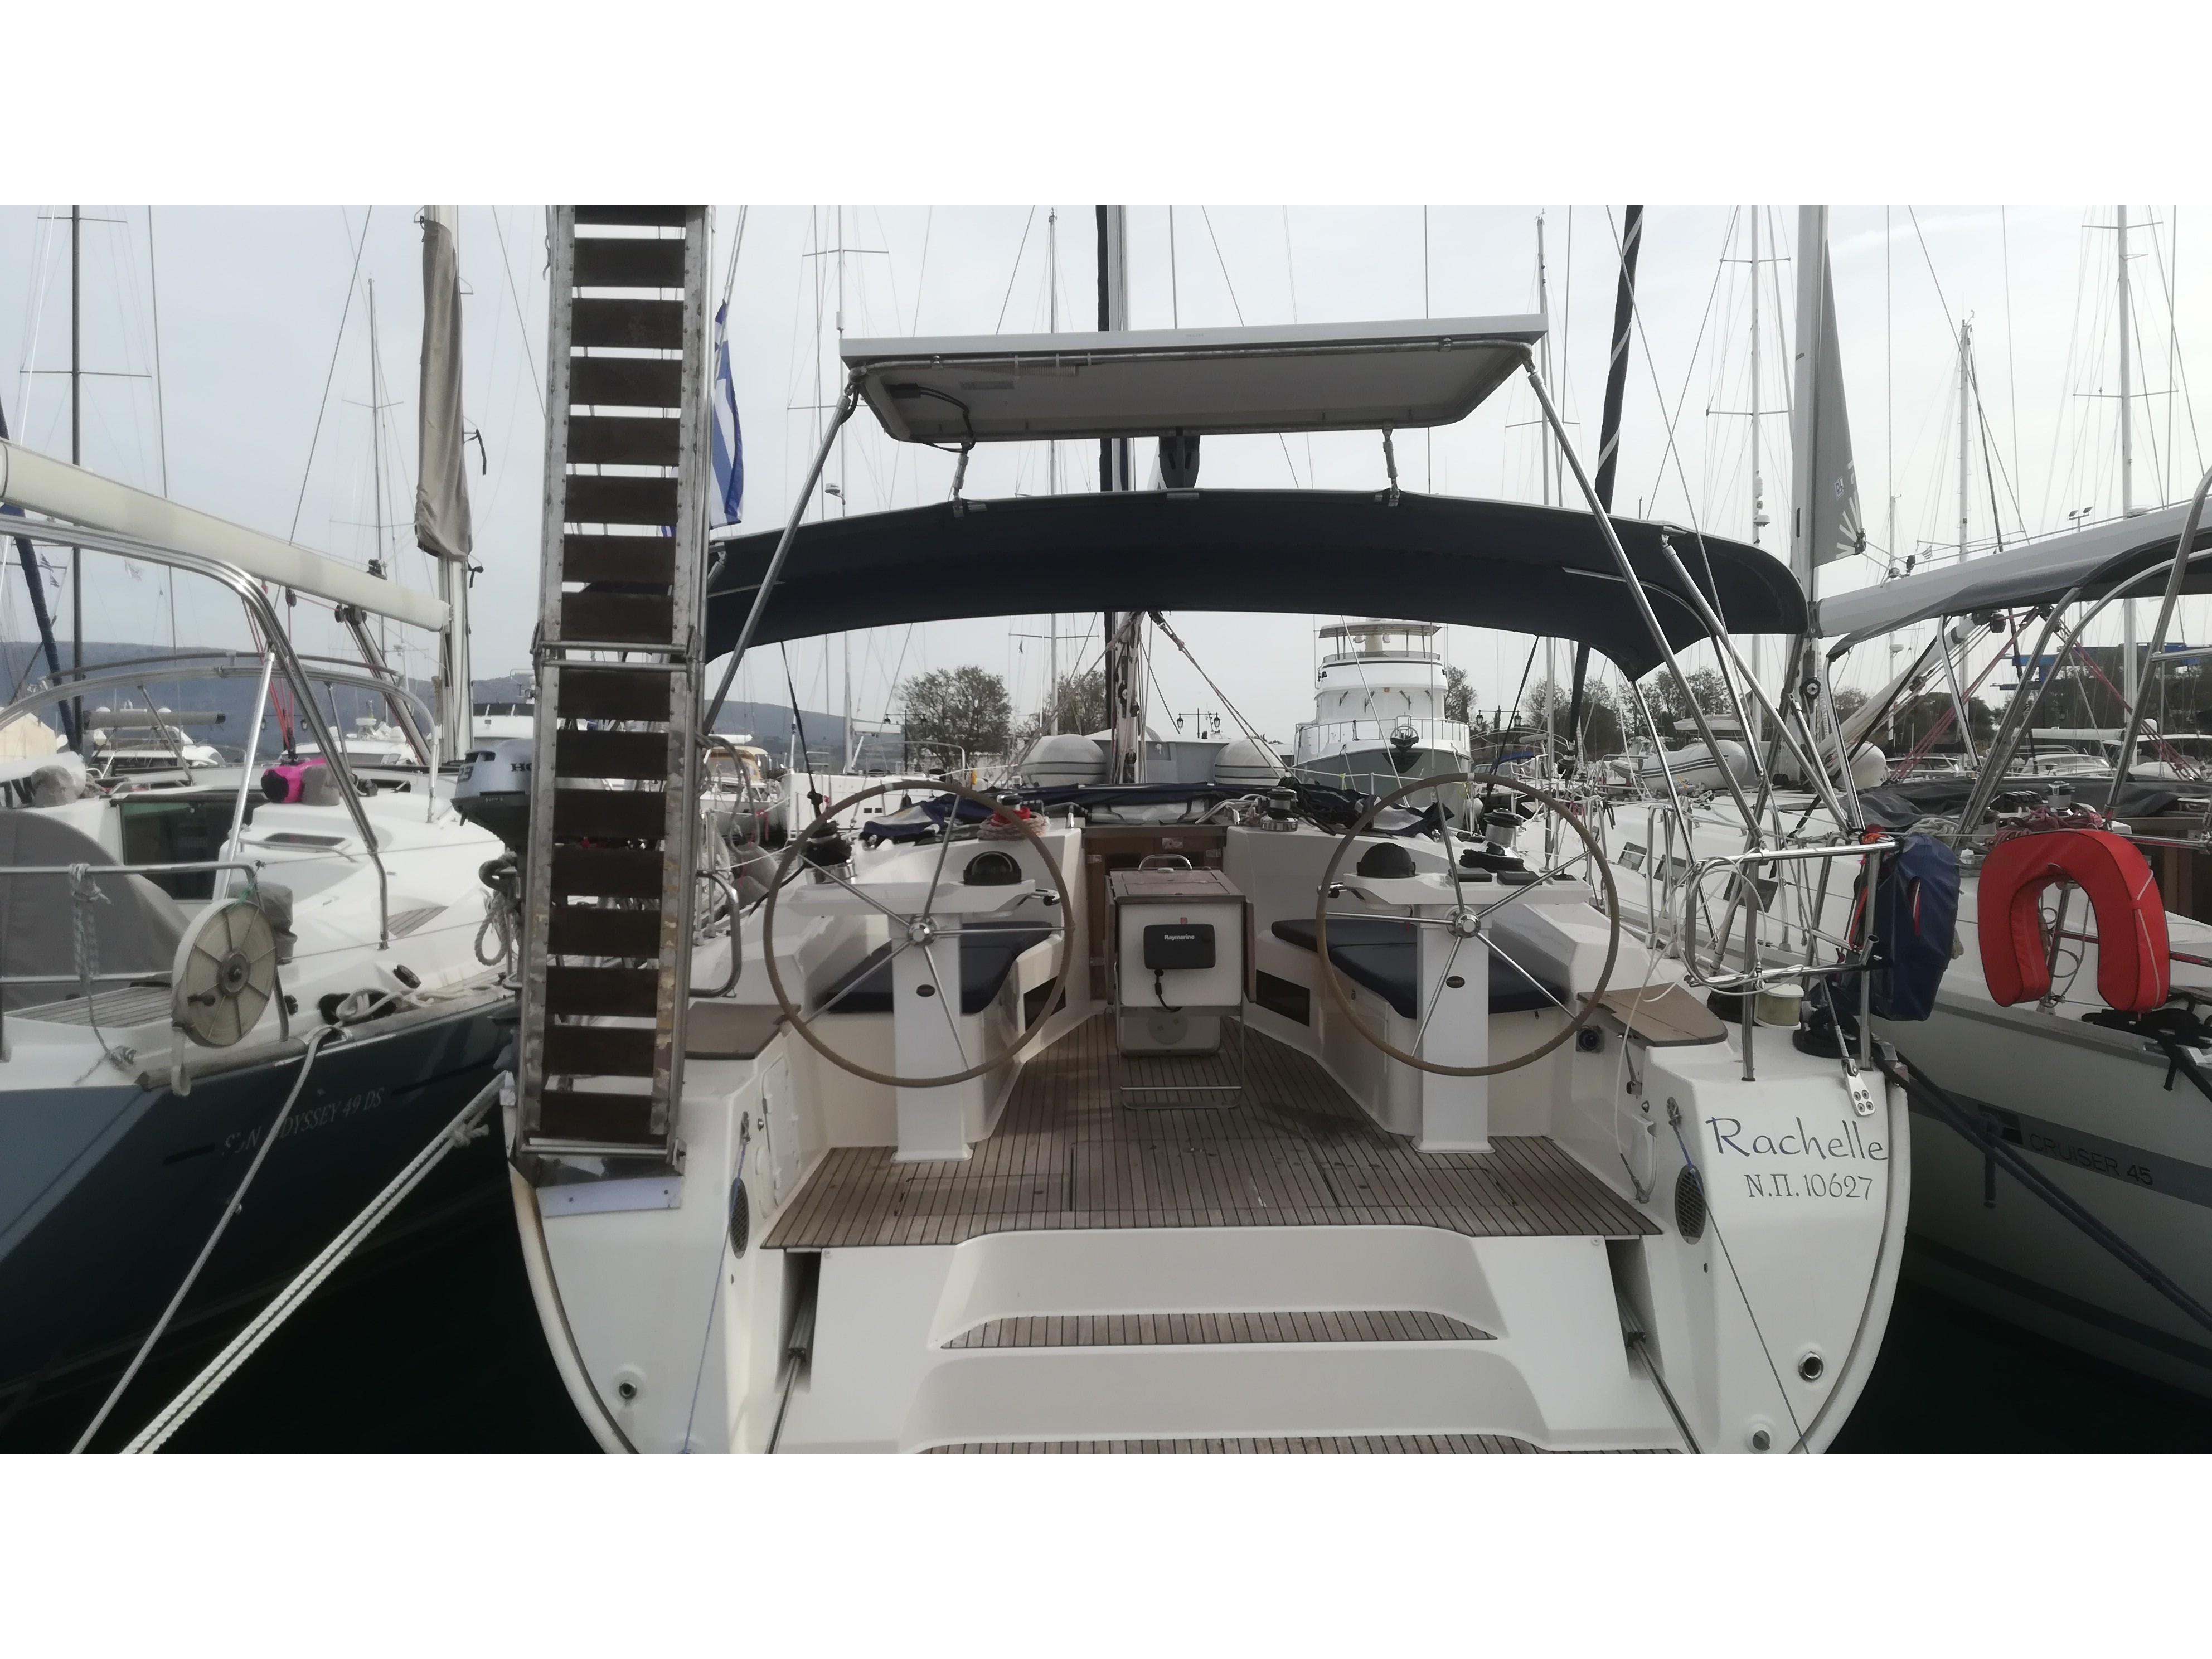 Rachelle Bavaria Cruiser 45